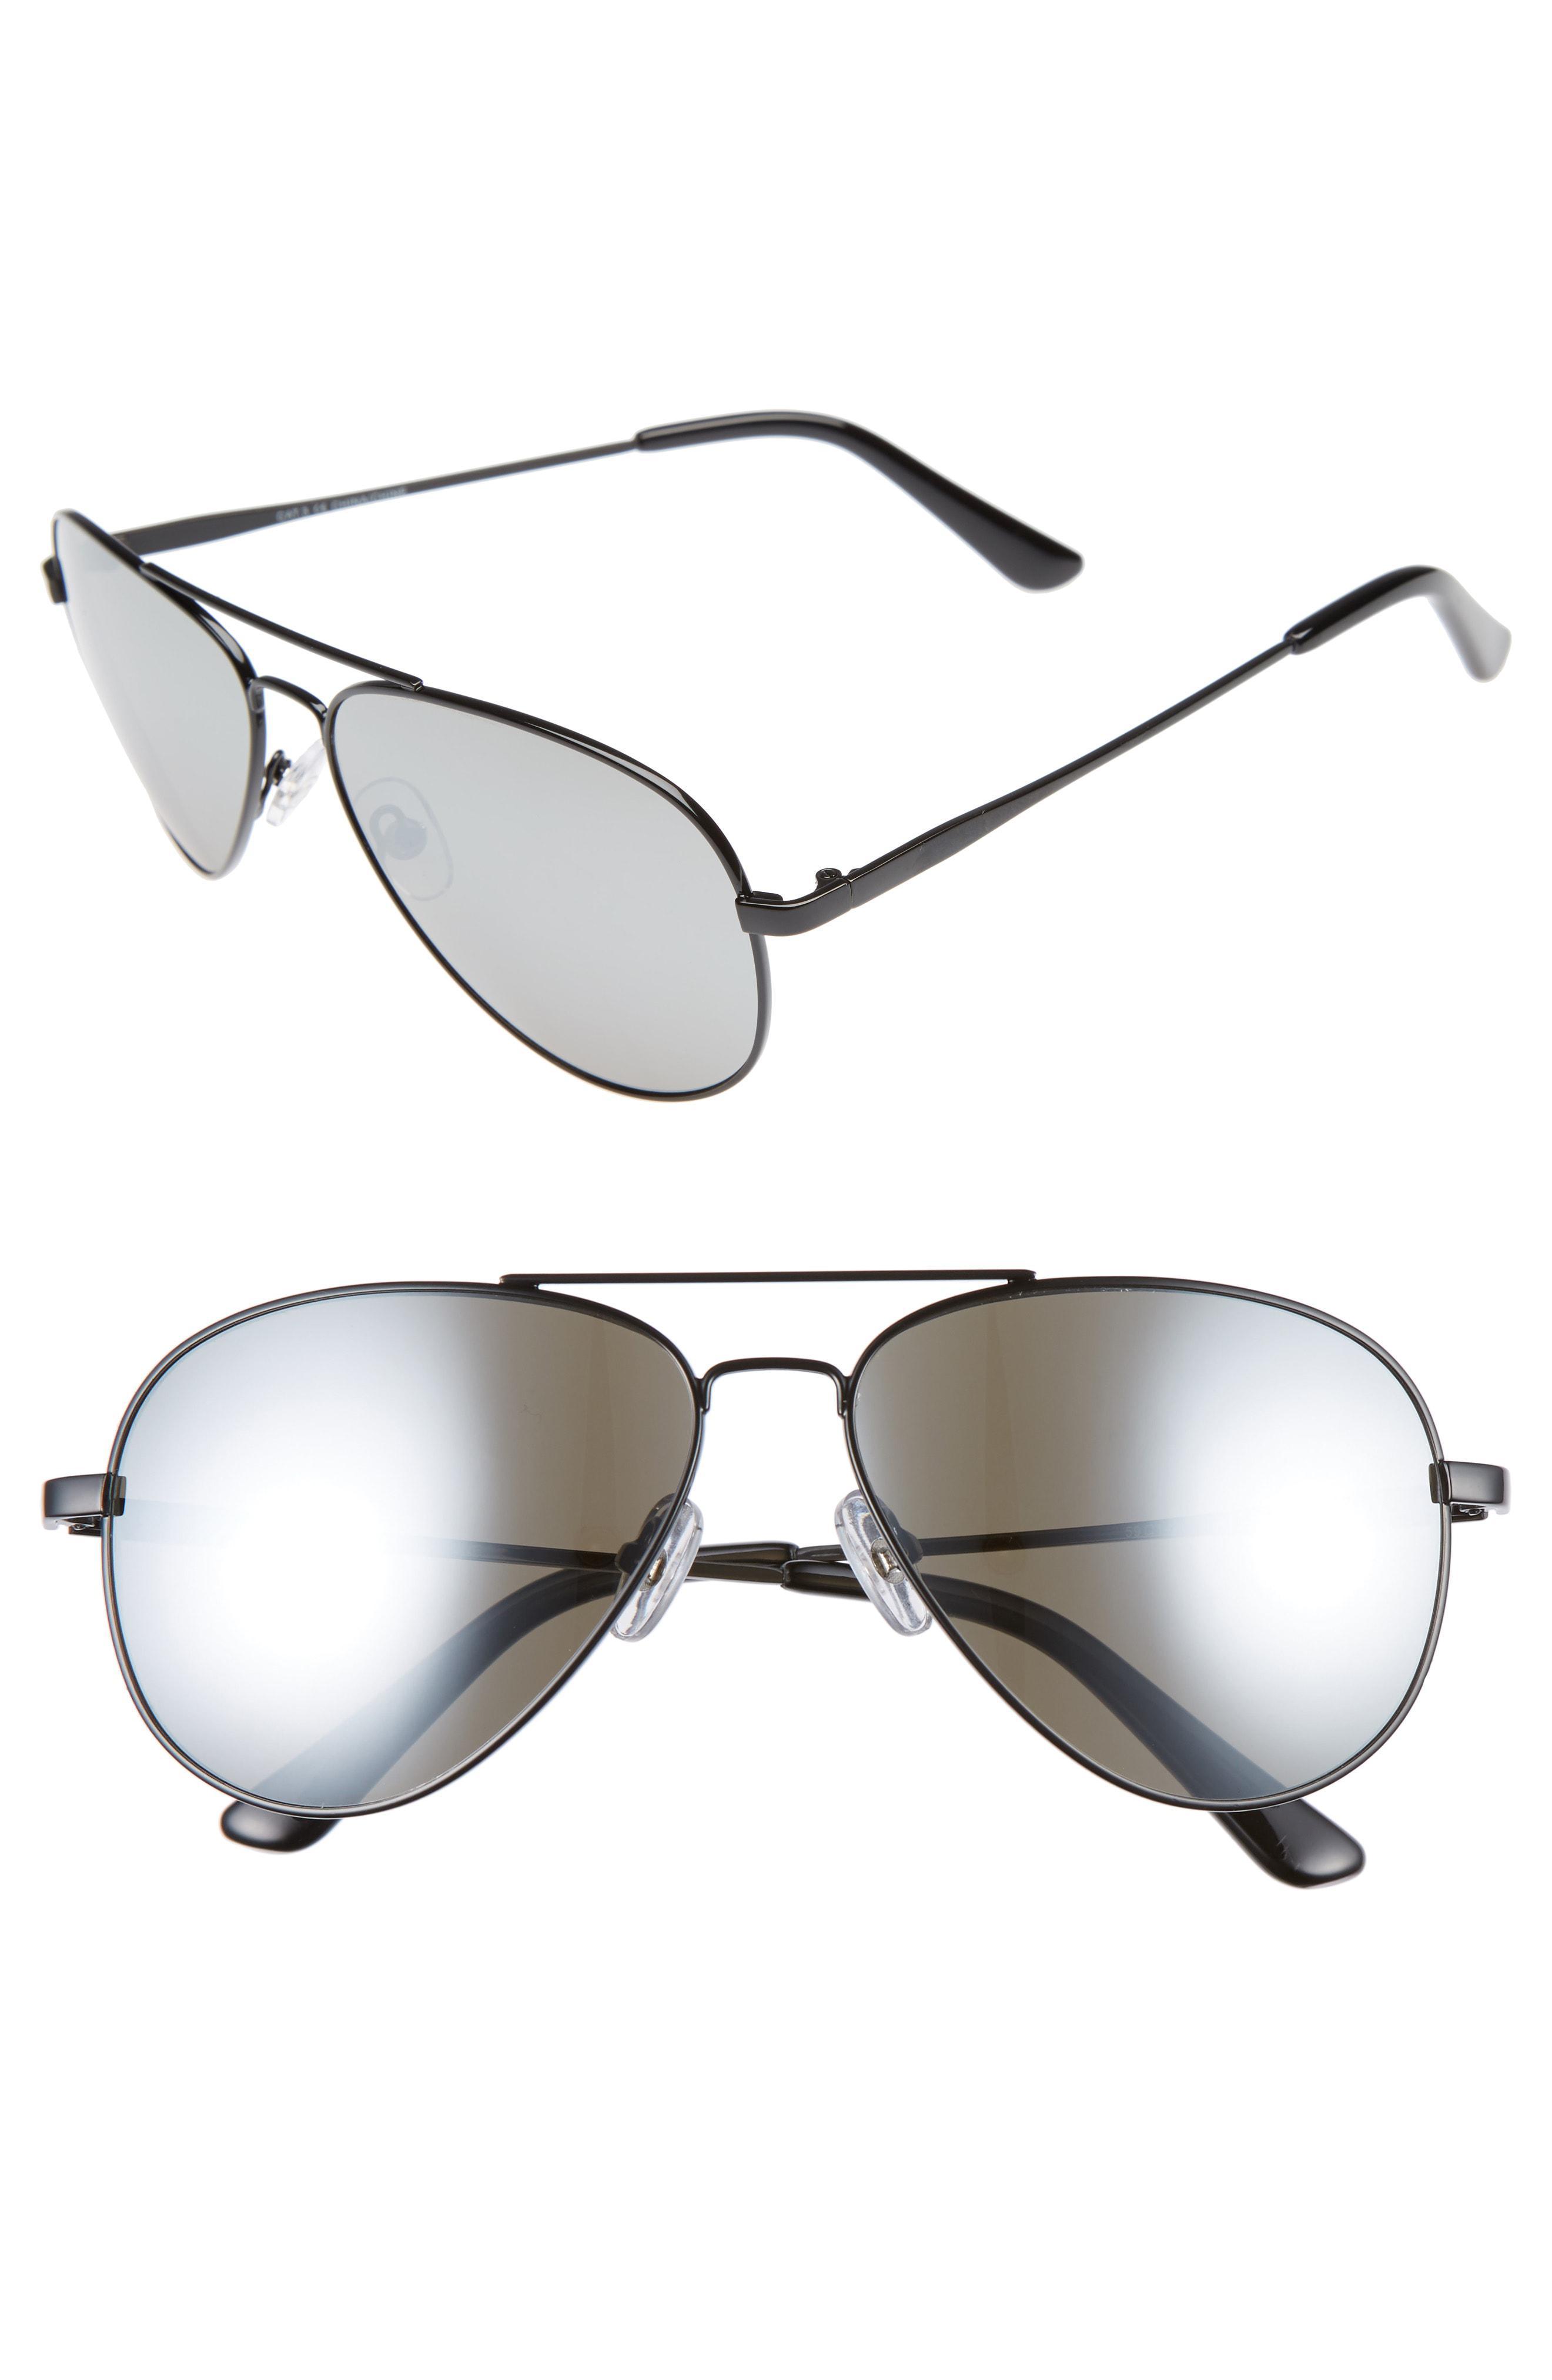 8db1c532abf Lyst - Nordstrom 1901 Pace 60mm Aviator Sunglasses - in Metallic for Men